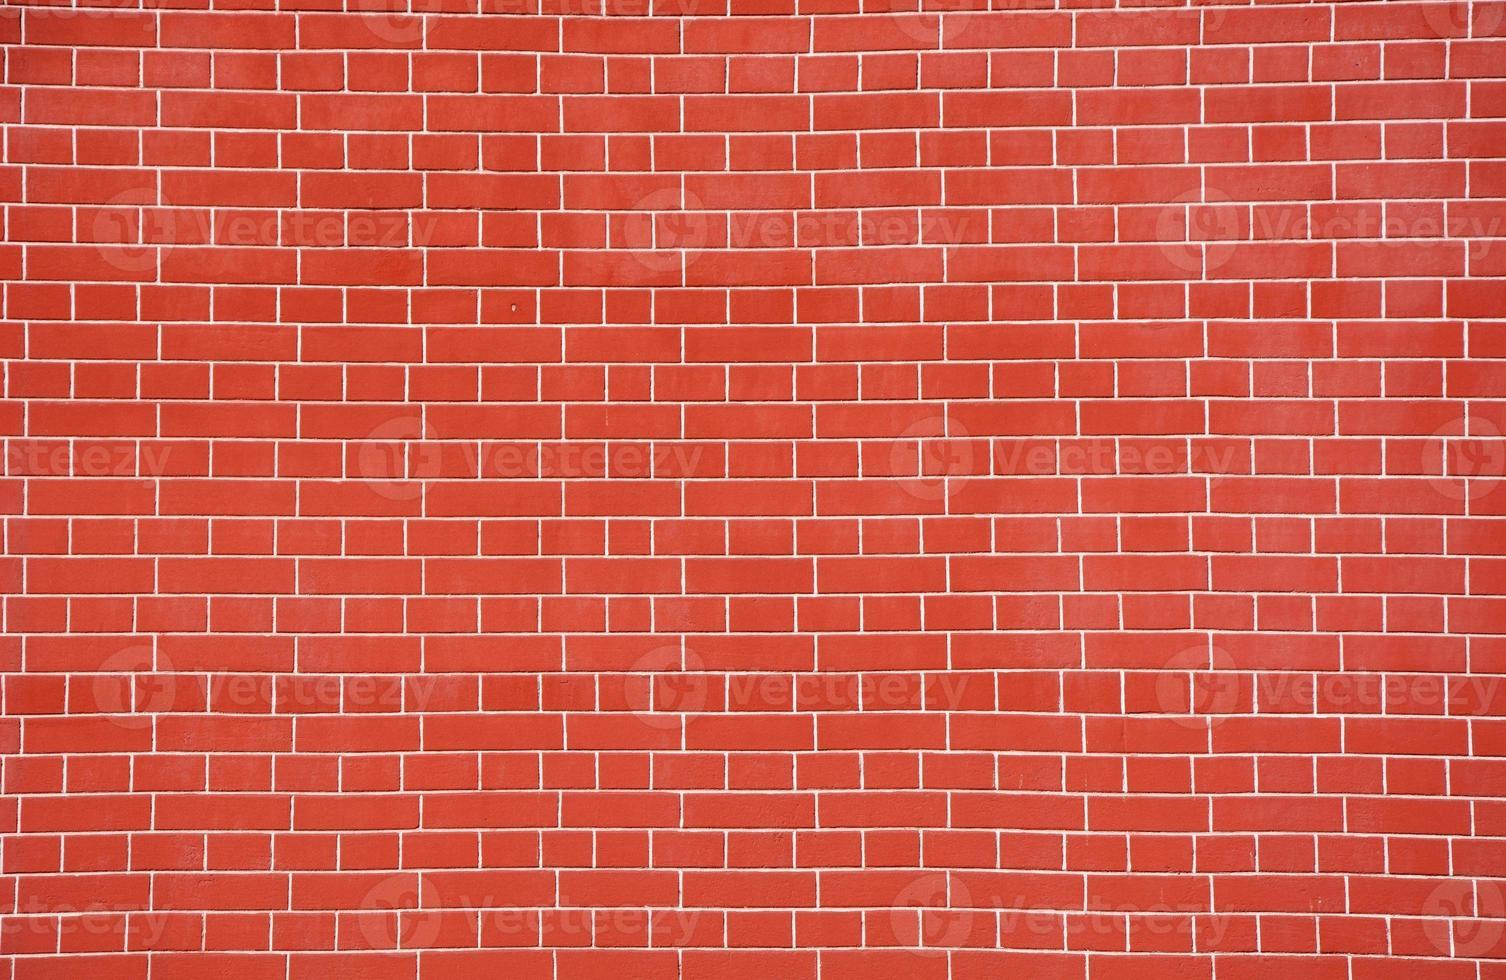 High resolution image of brick wall photo